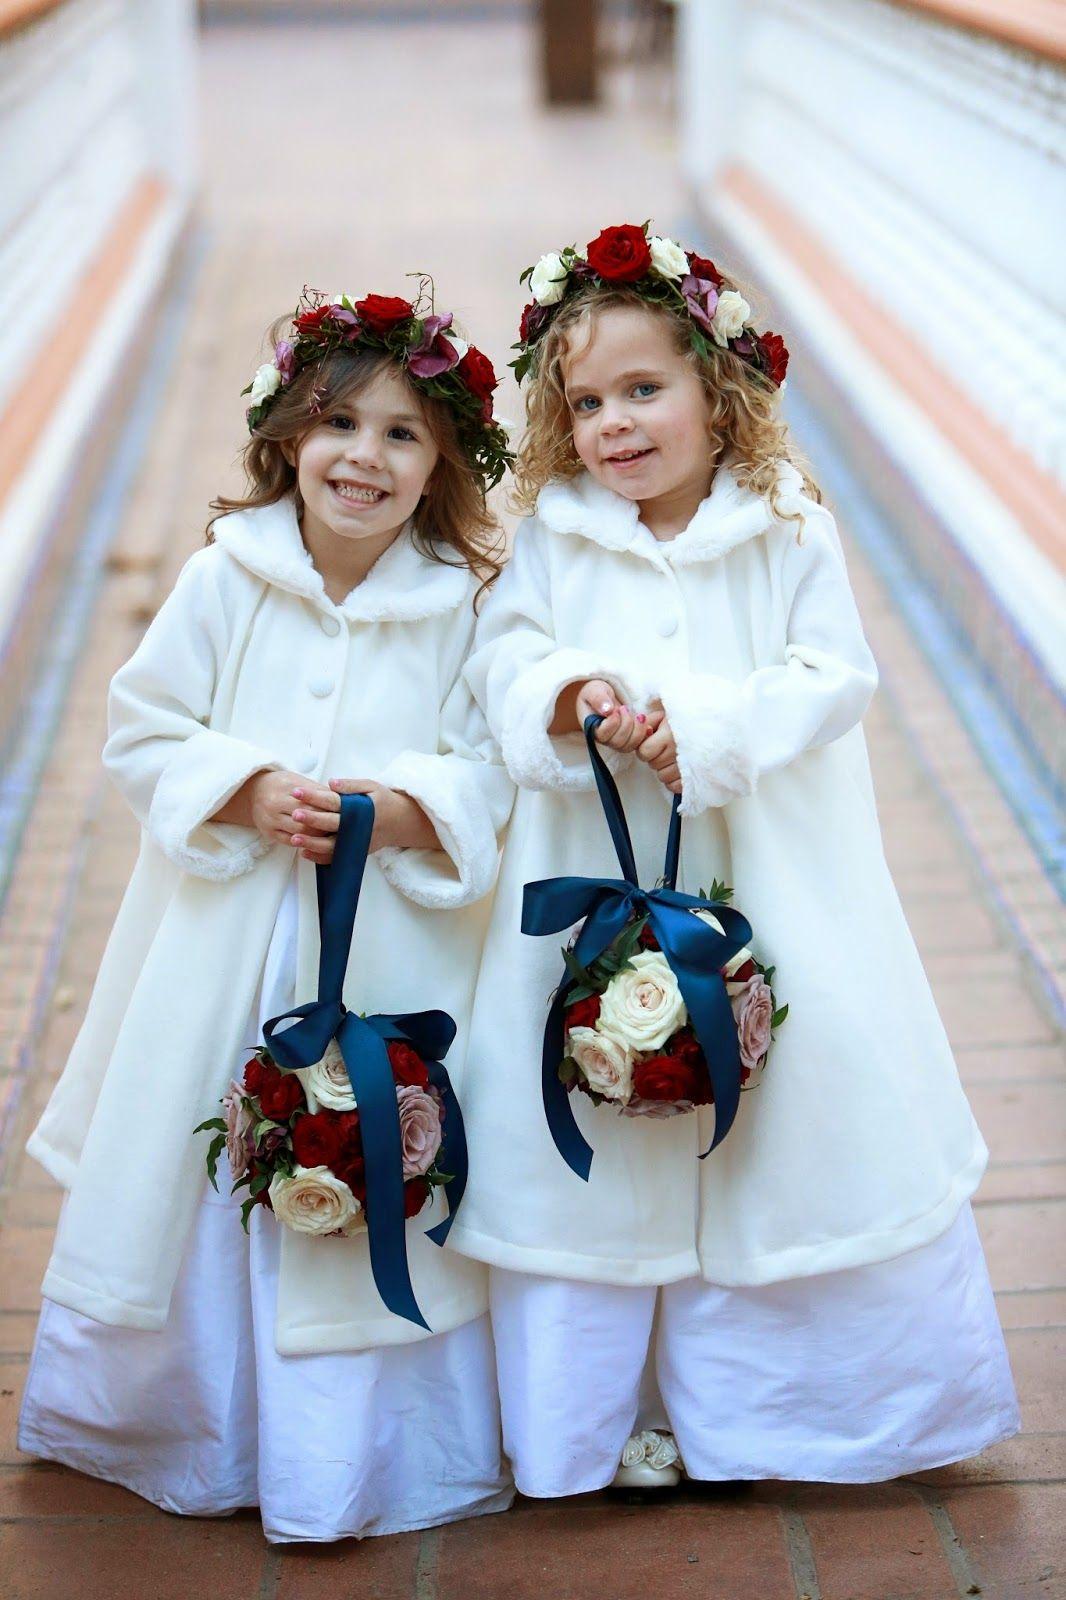 76233a8e0fb Winter Wedding Flower Girl Dresses - Gomes Weine AG